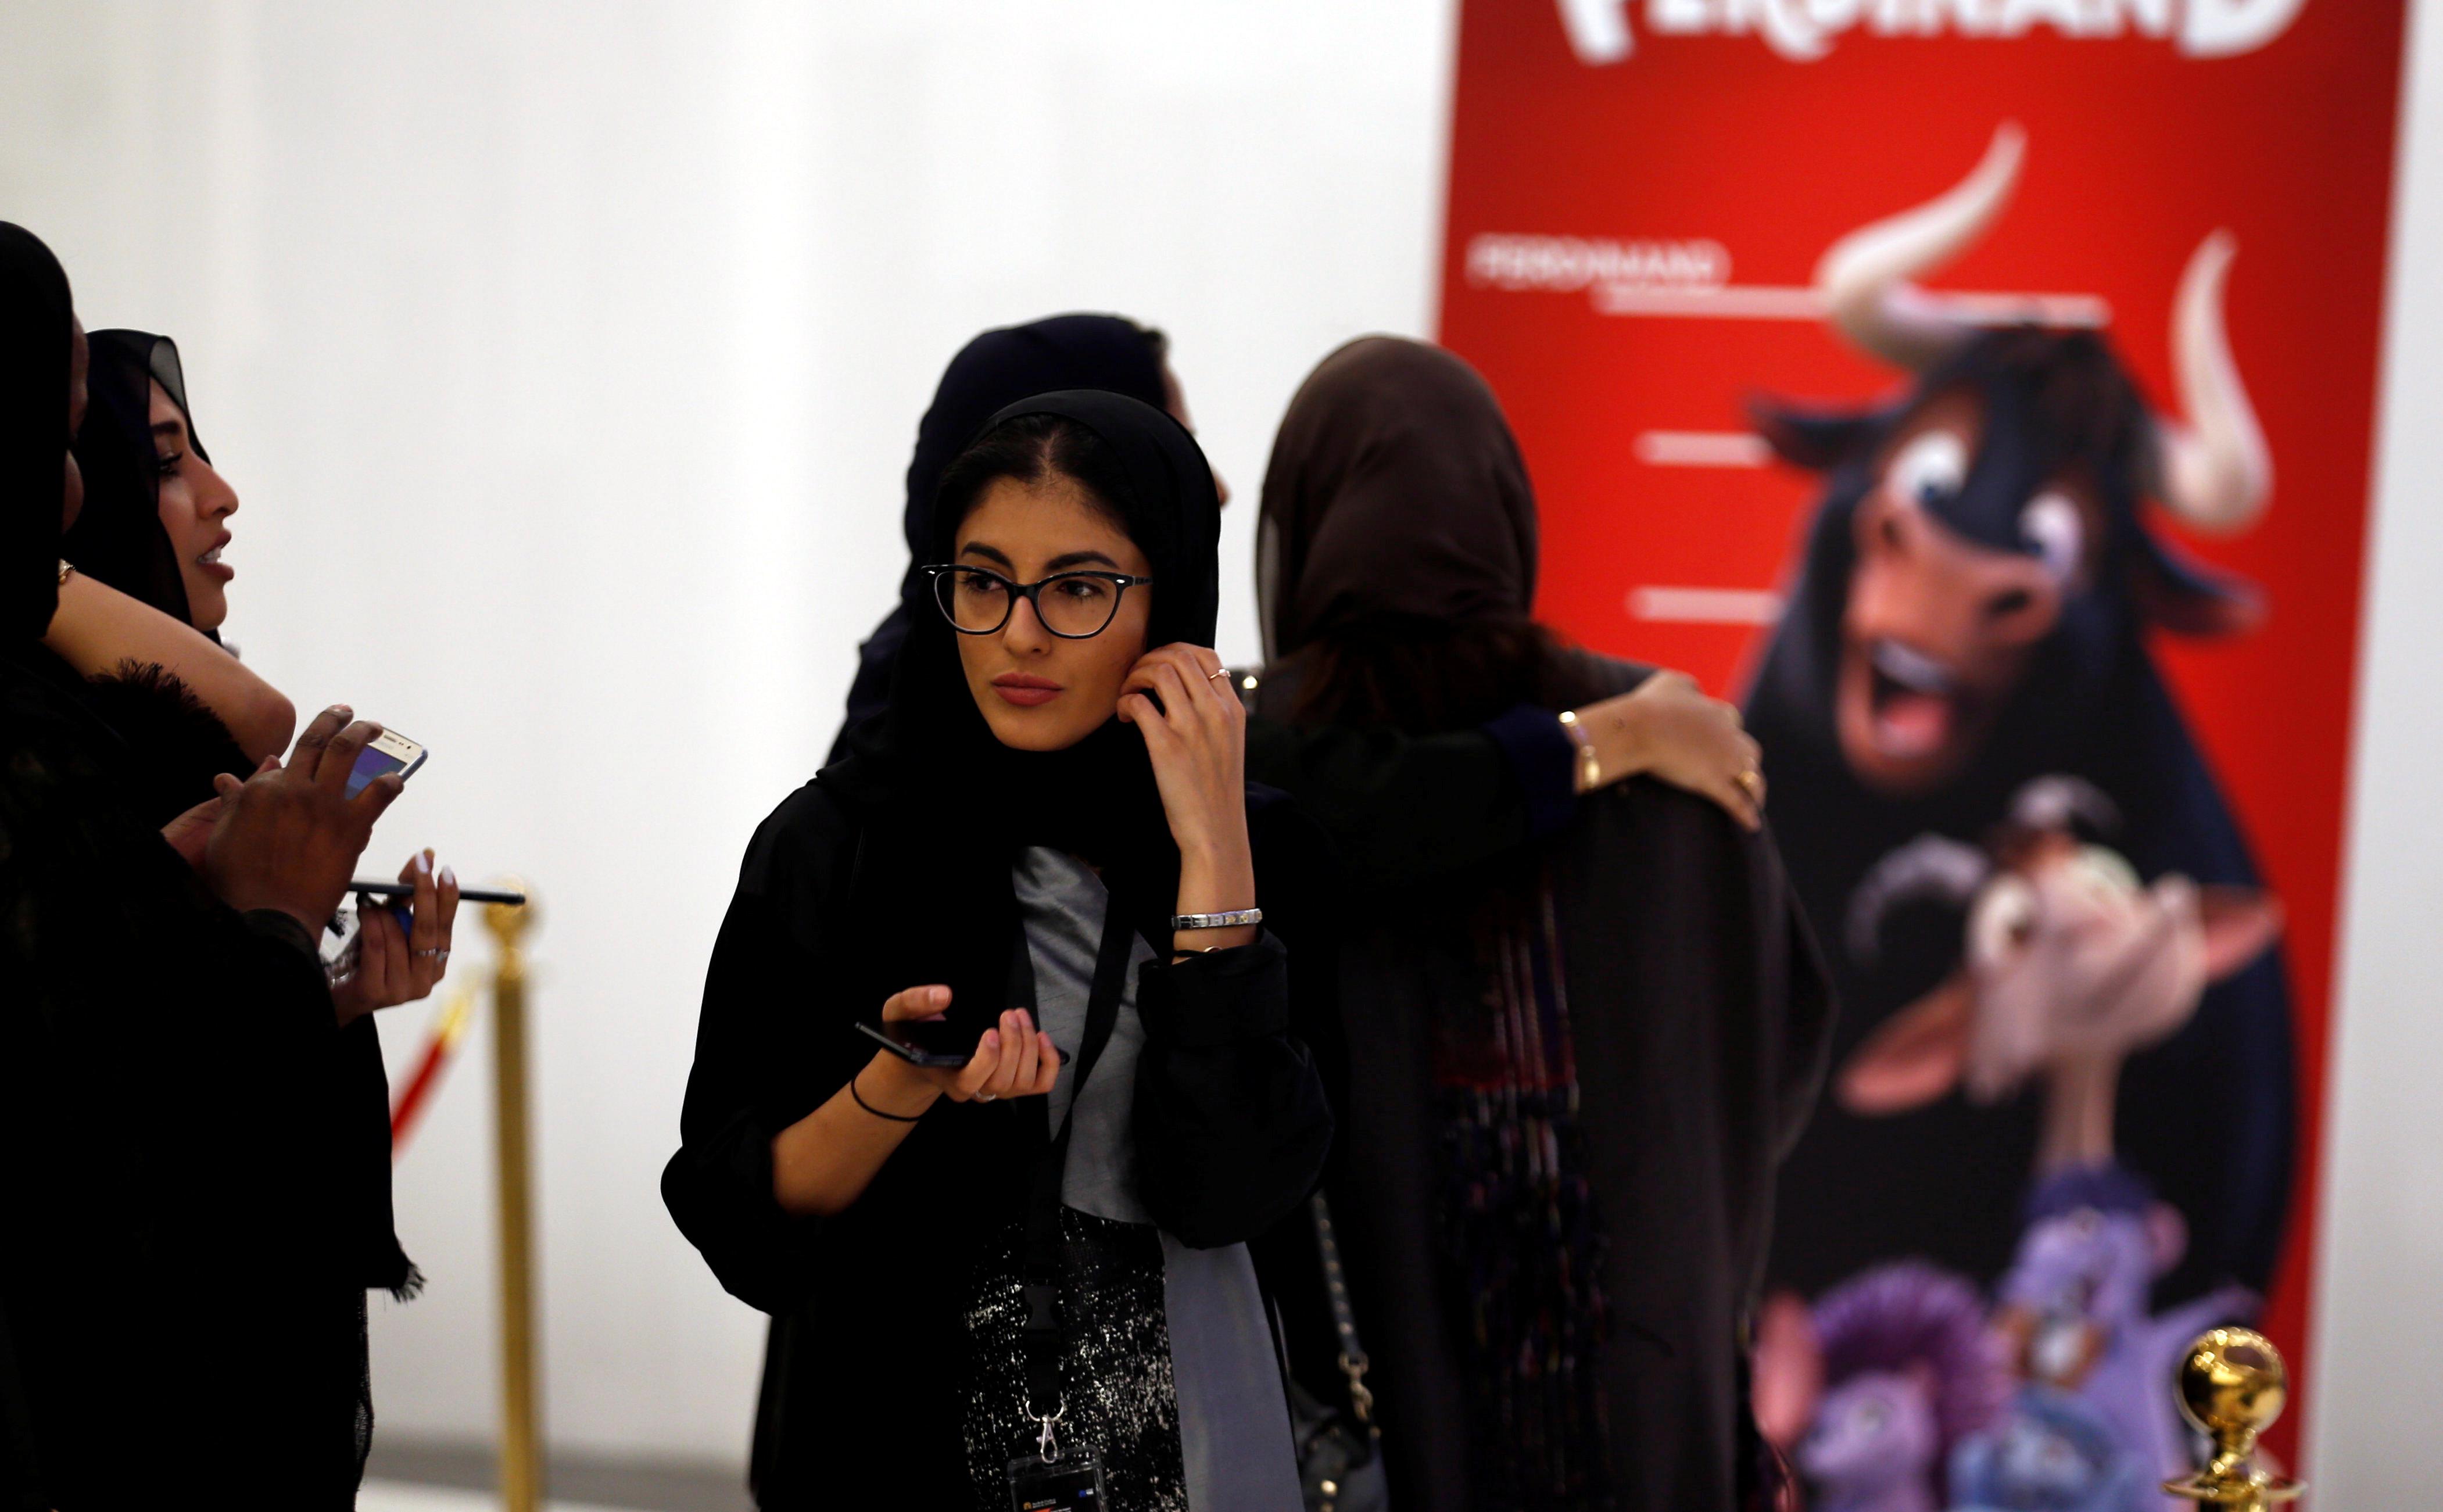 Saudi women attend the opening of a cinema at Riyadh Park mall, in Riyadh, Saudi Arabia April 30, 2018.